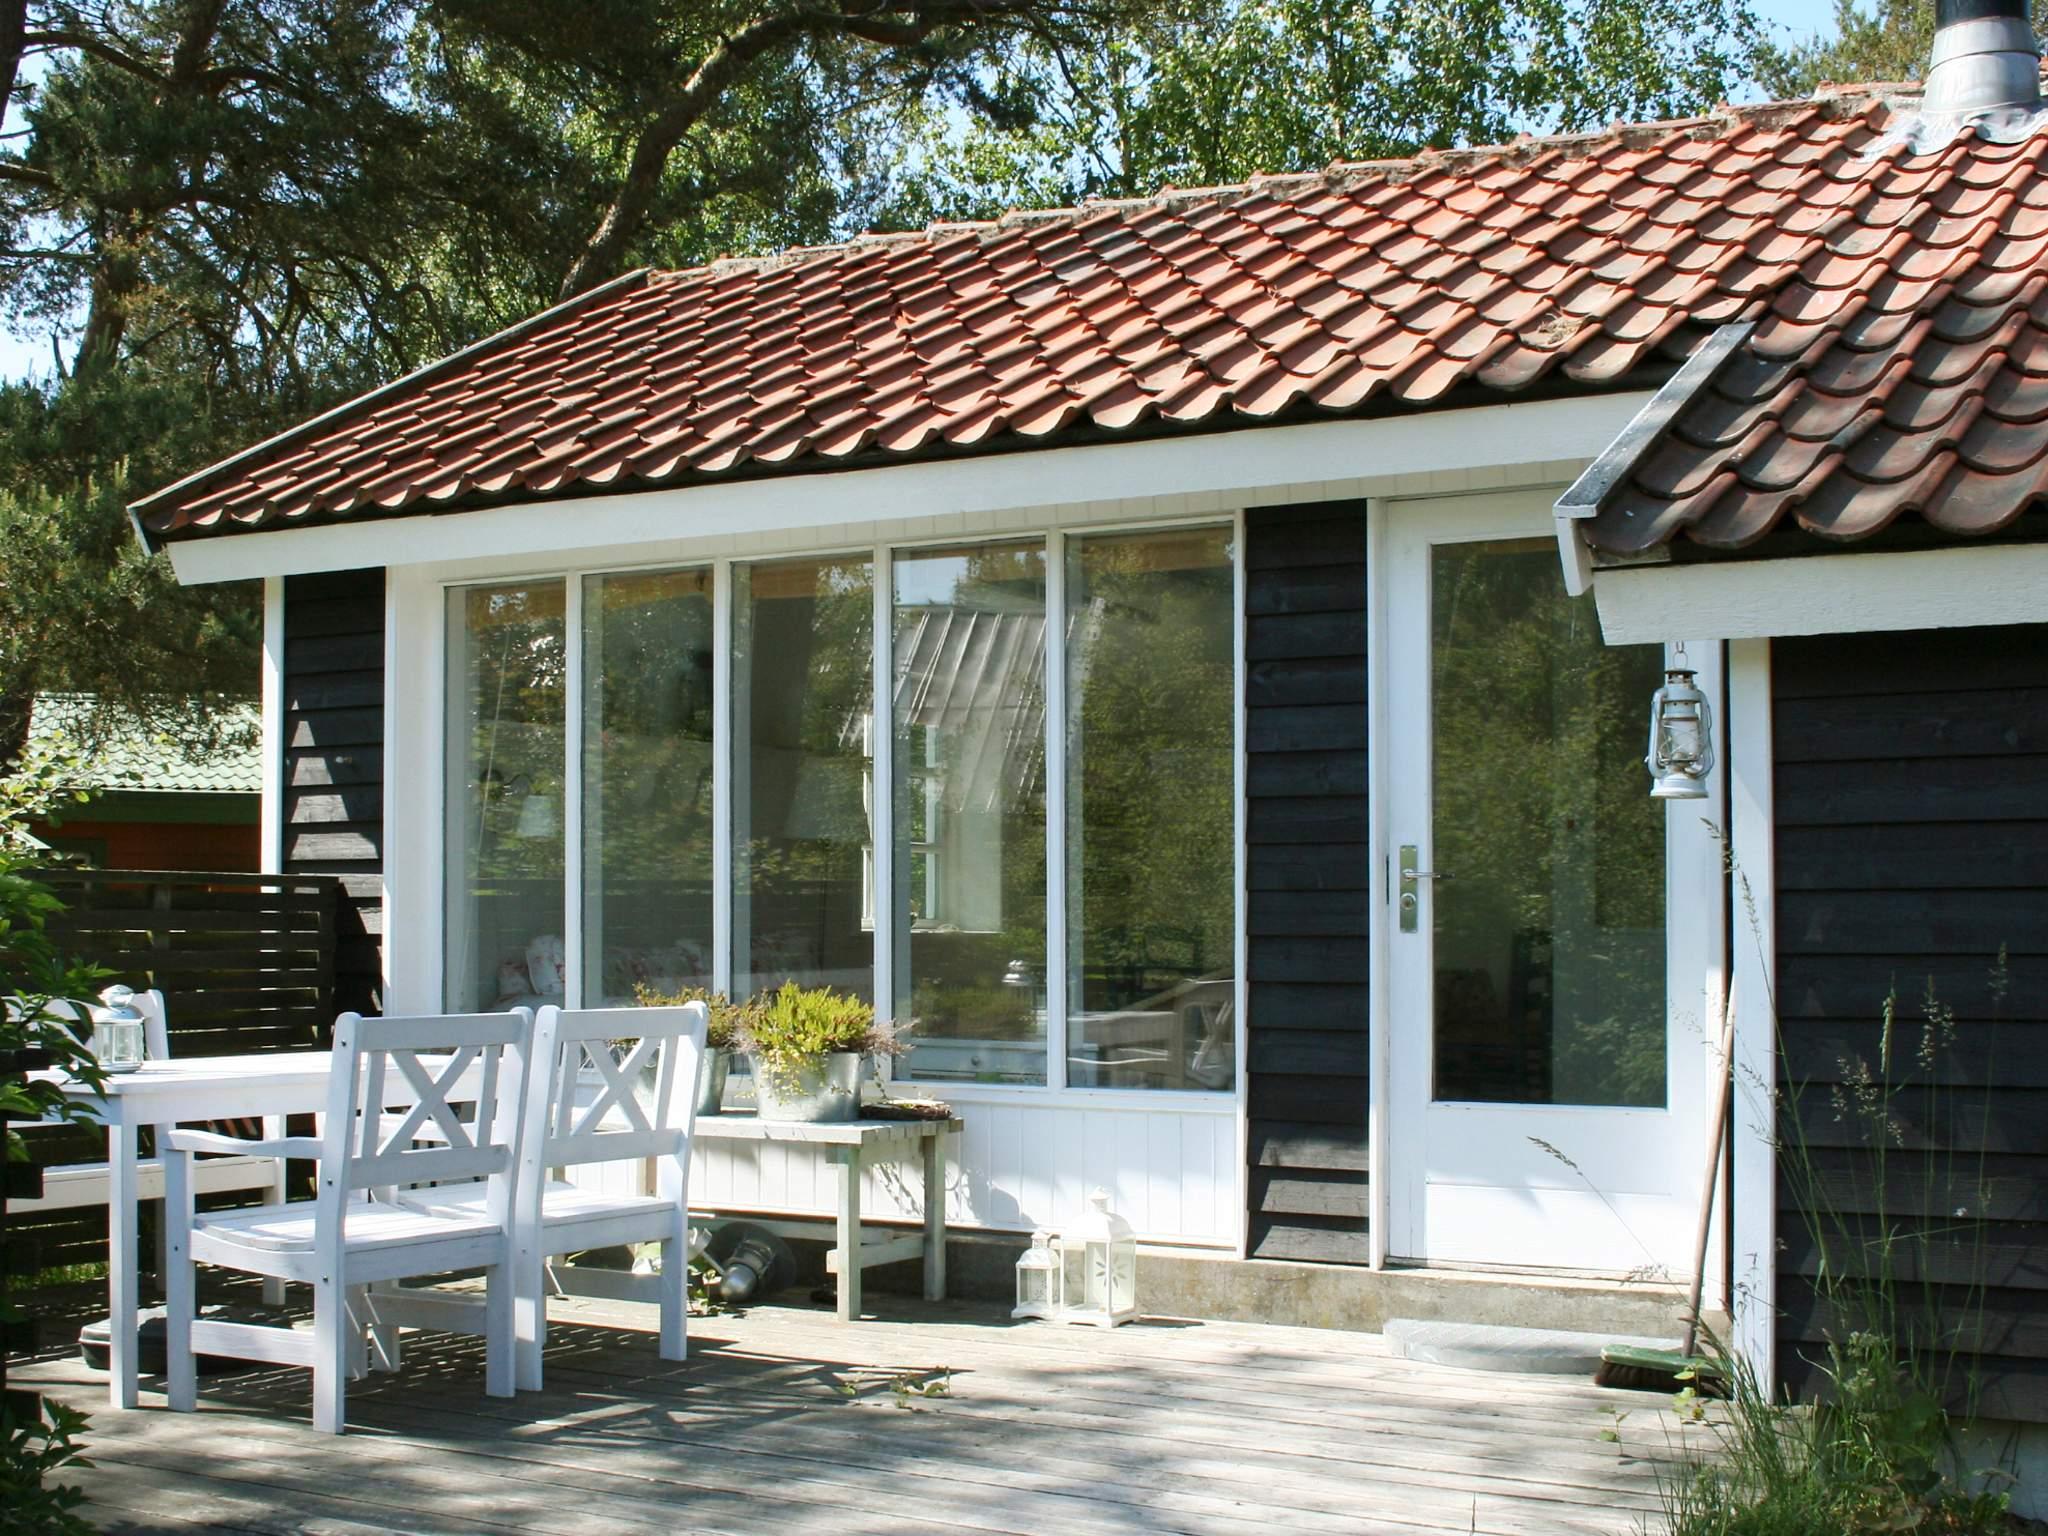 Ferienhaus Balka Strand (82298), Balke, , Bornholm, Dänemark, Bild 7